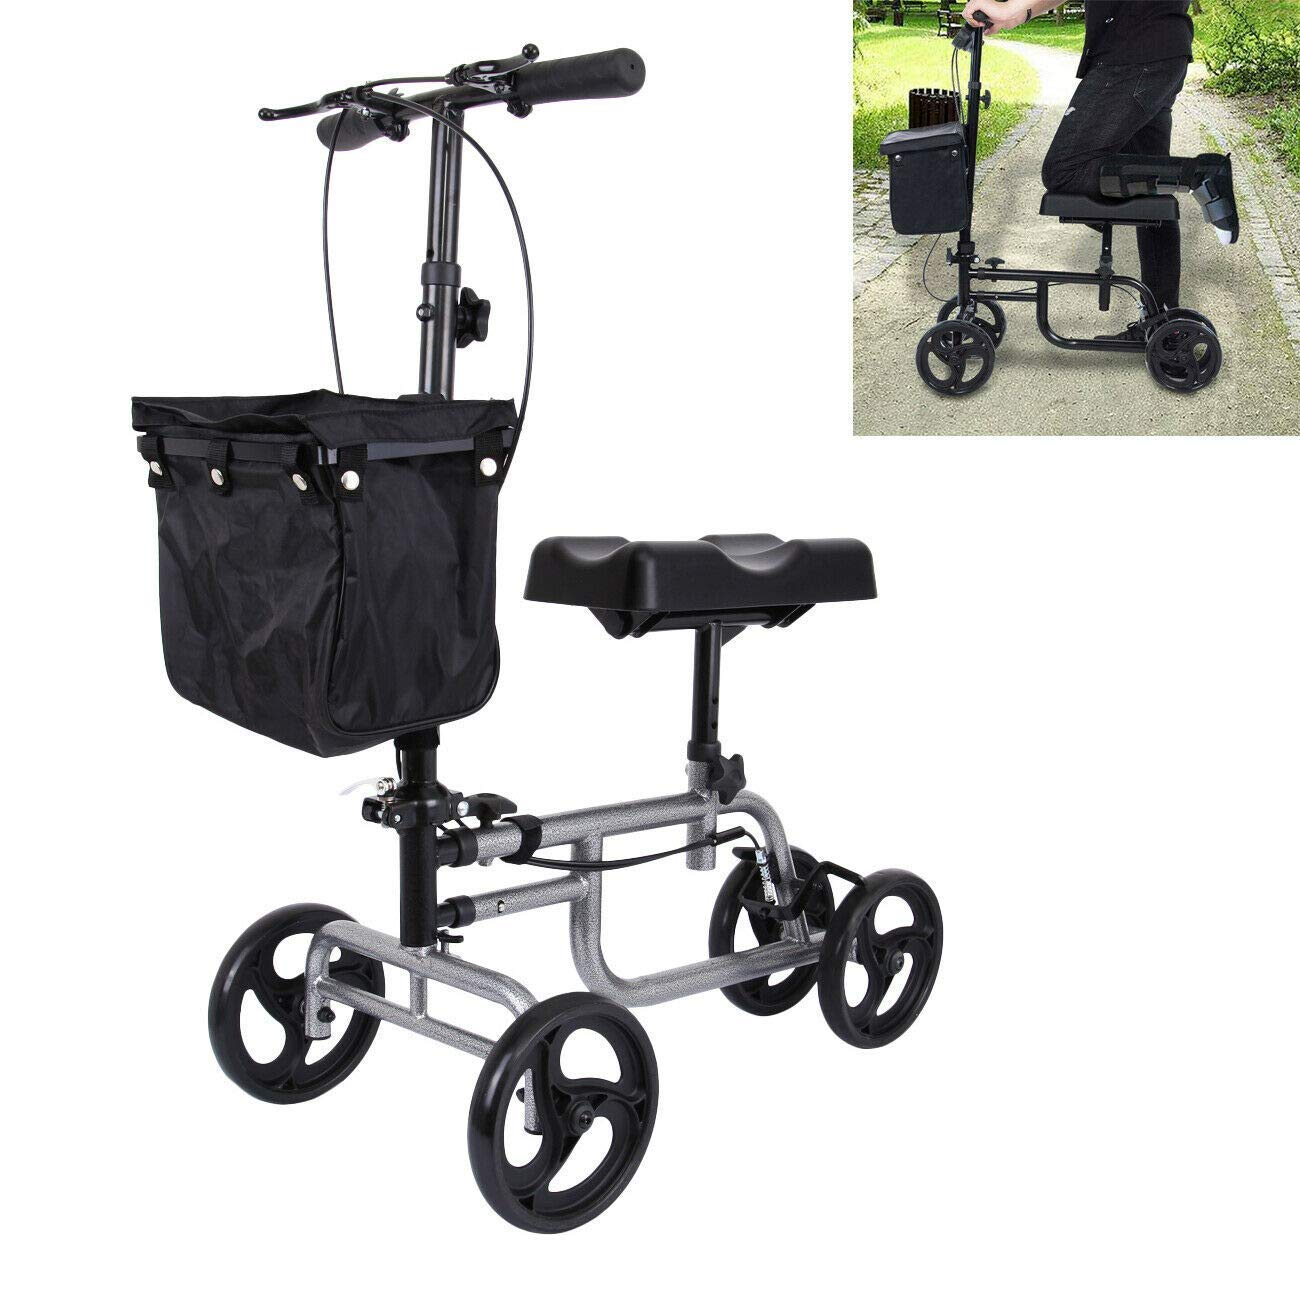 Yonntech Steerable Injuries Crutches Alternative